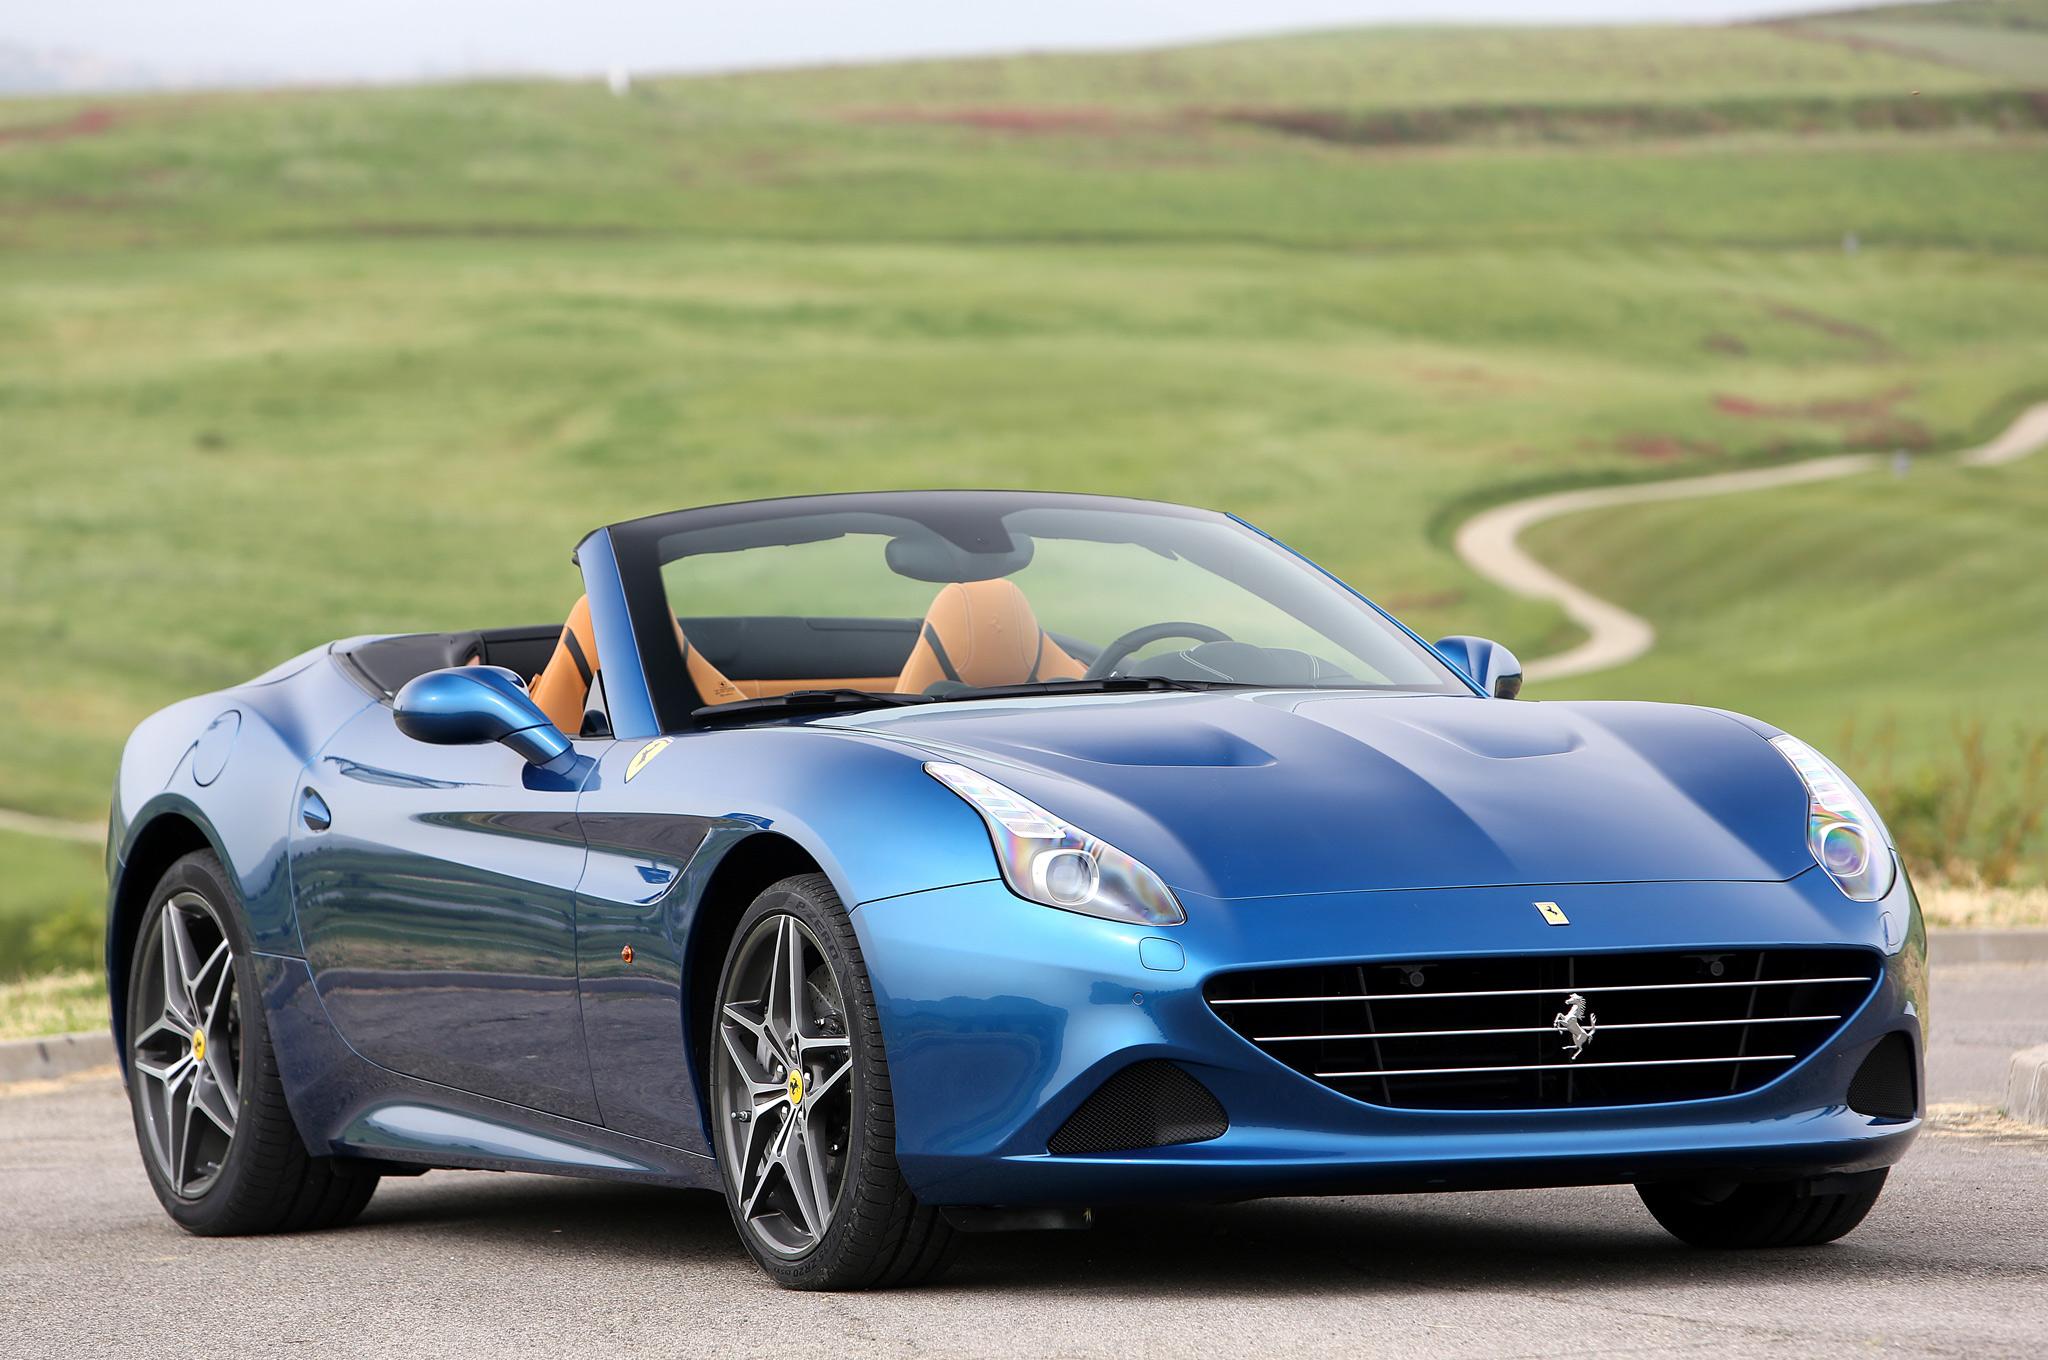 Ferrari California T 2015 -- Specifications, Price and Release